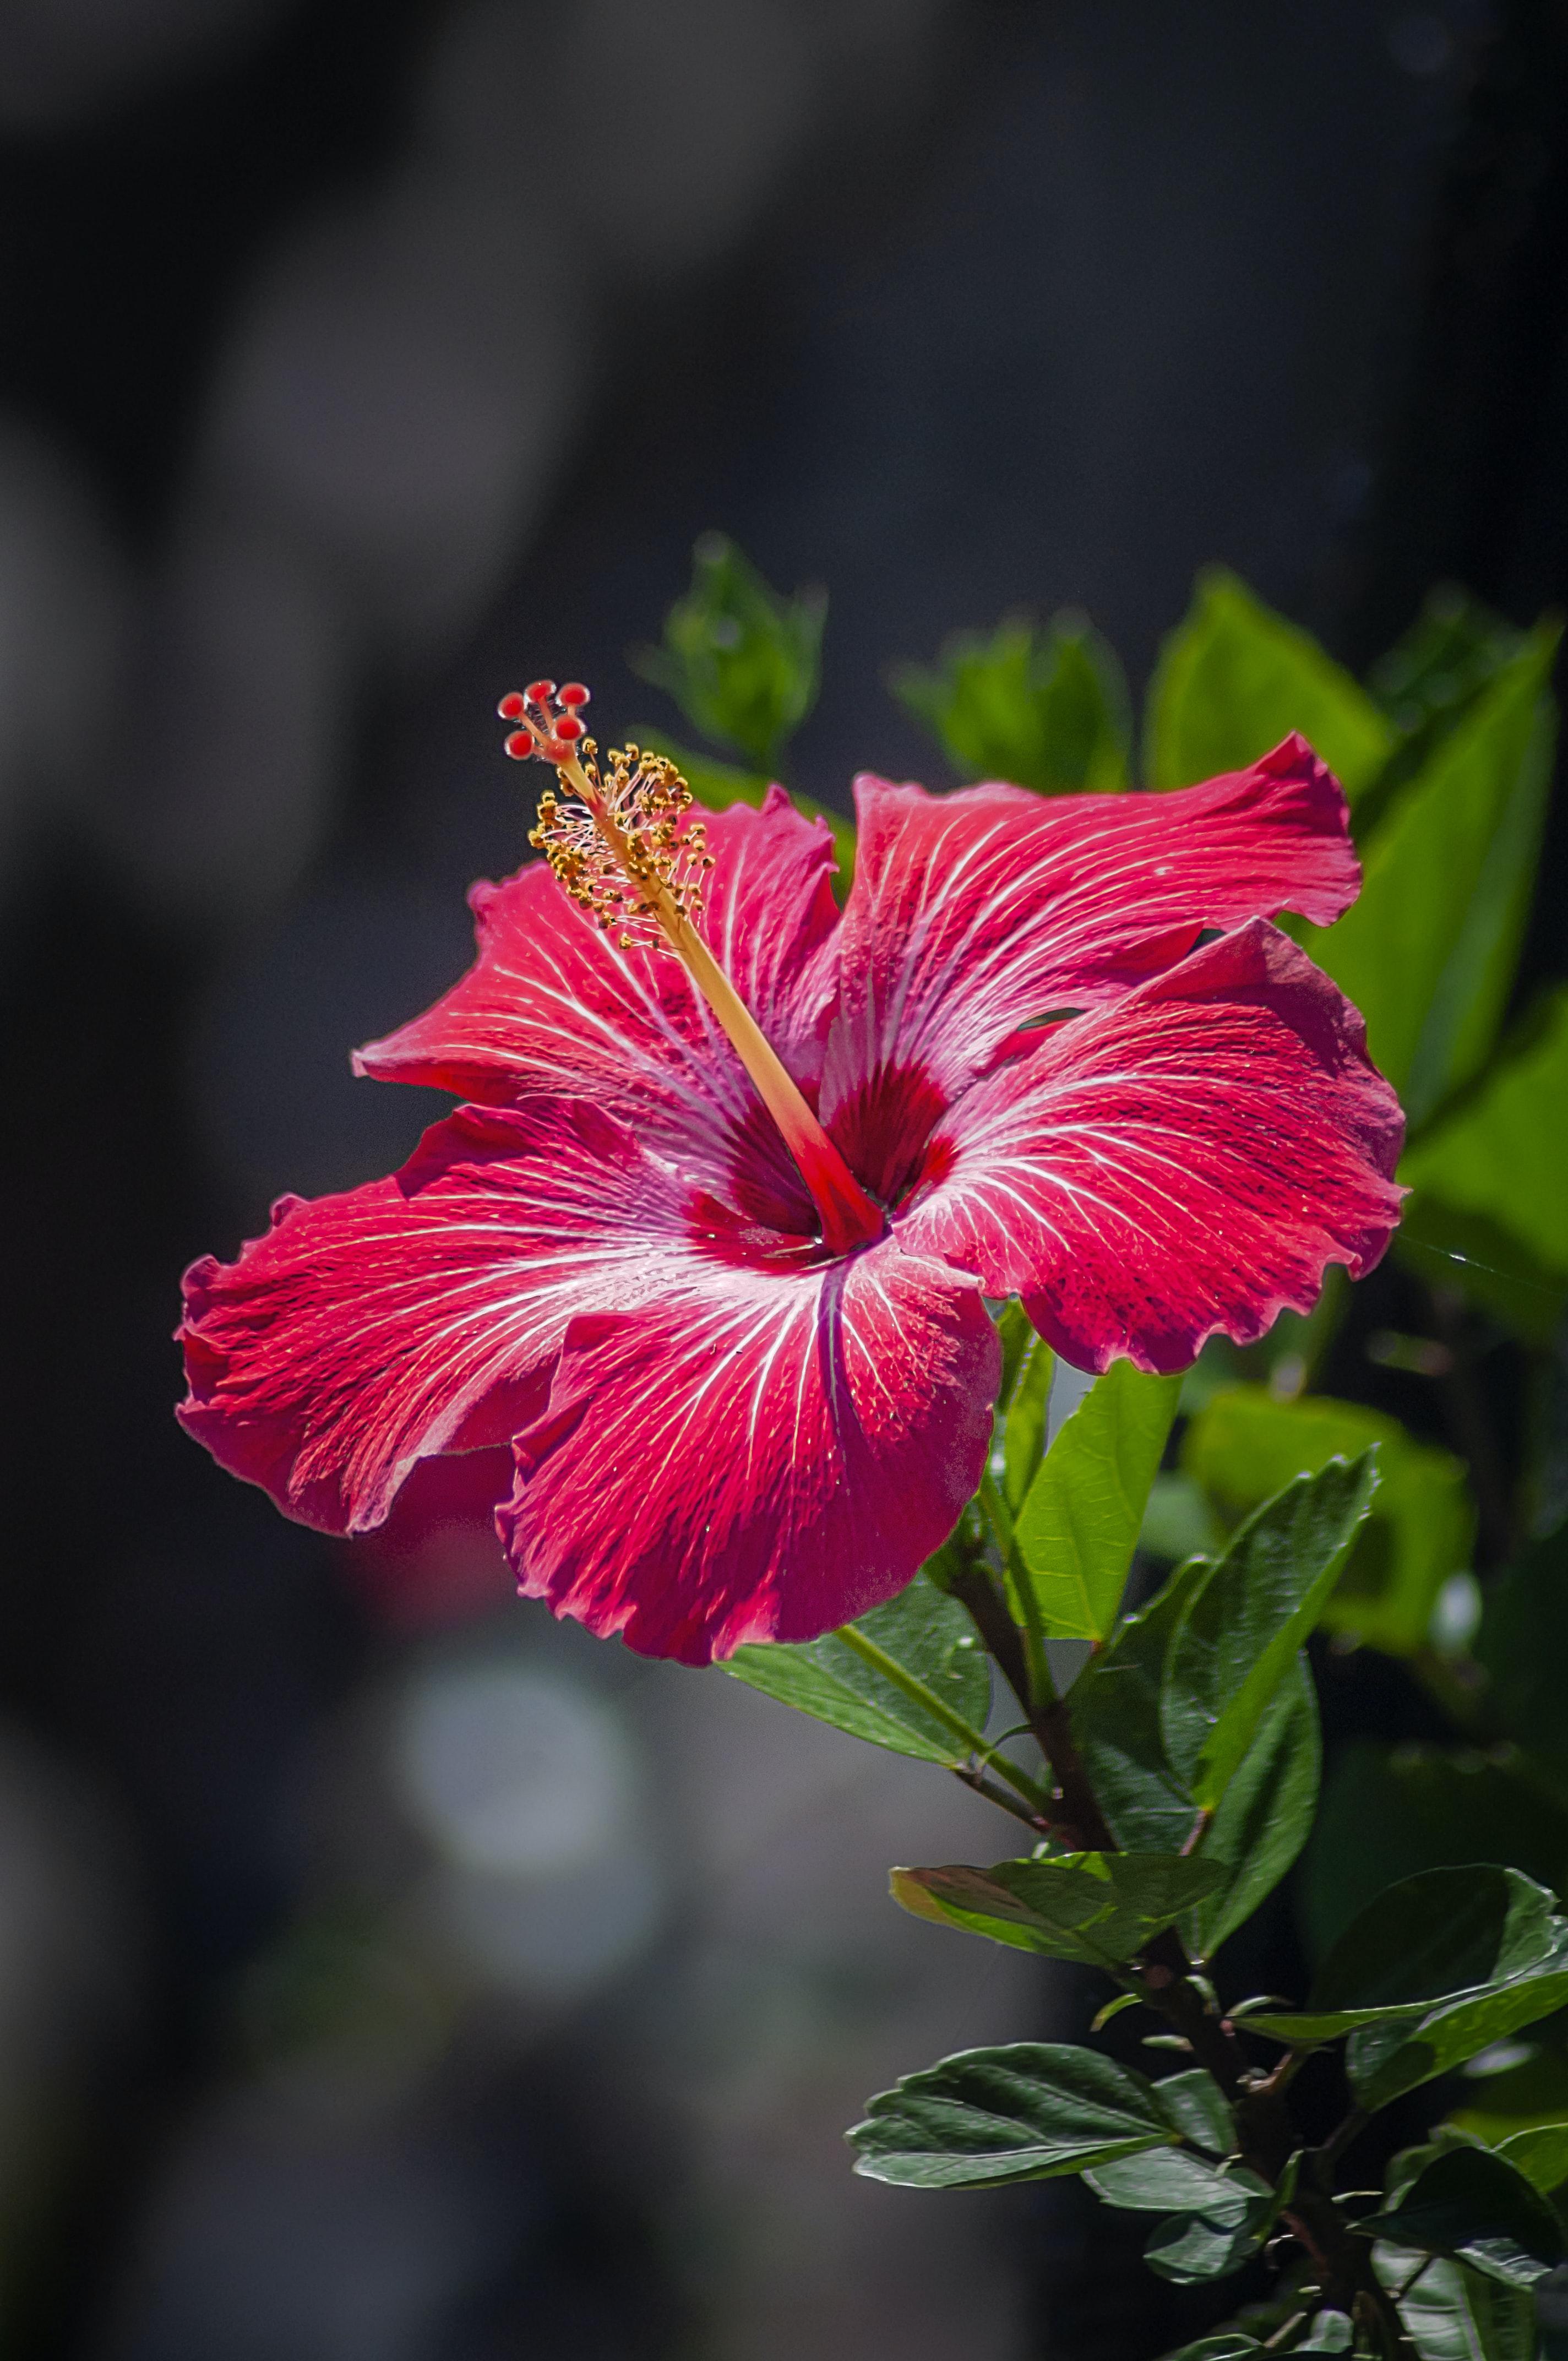 Red Hibiscus Flower Photo Free Plant Image On Unsplash